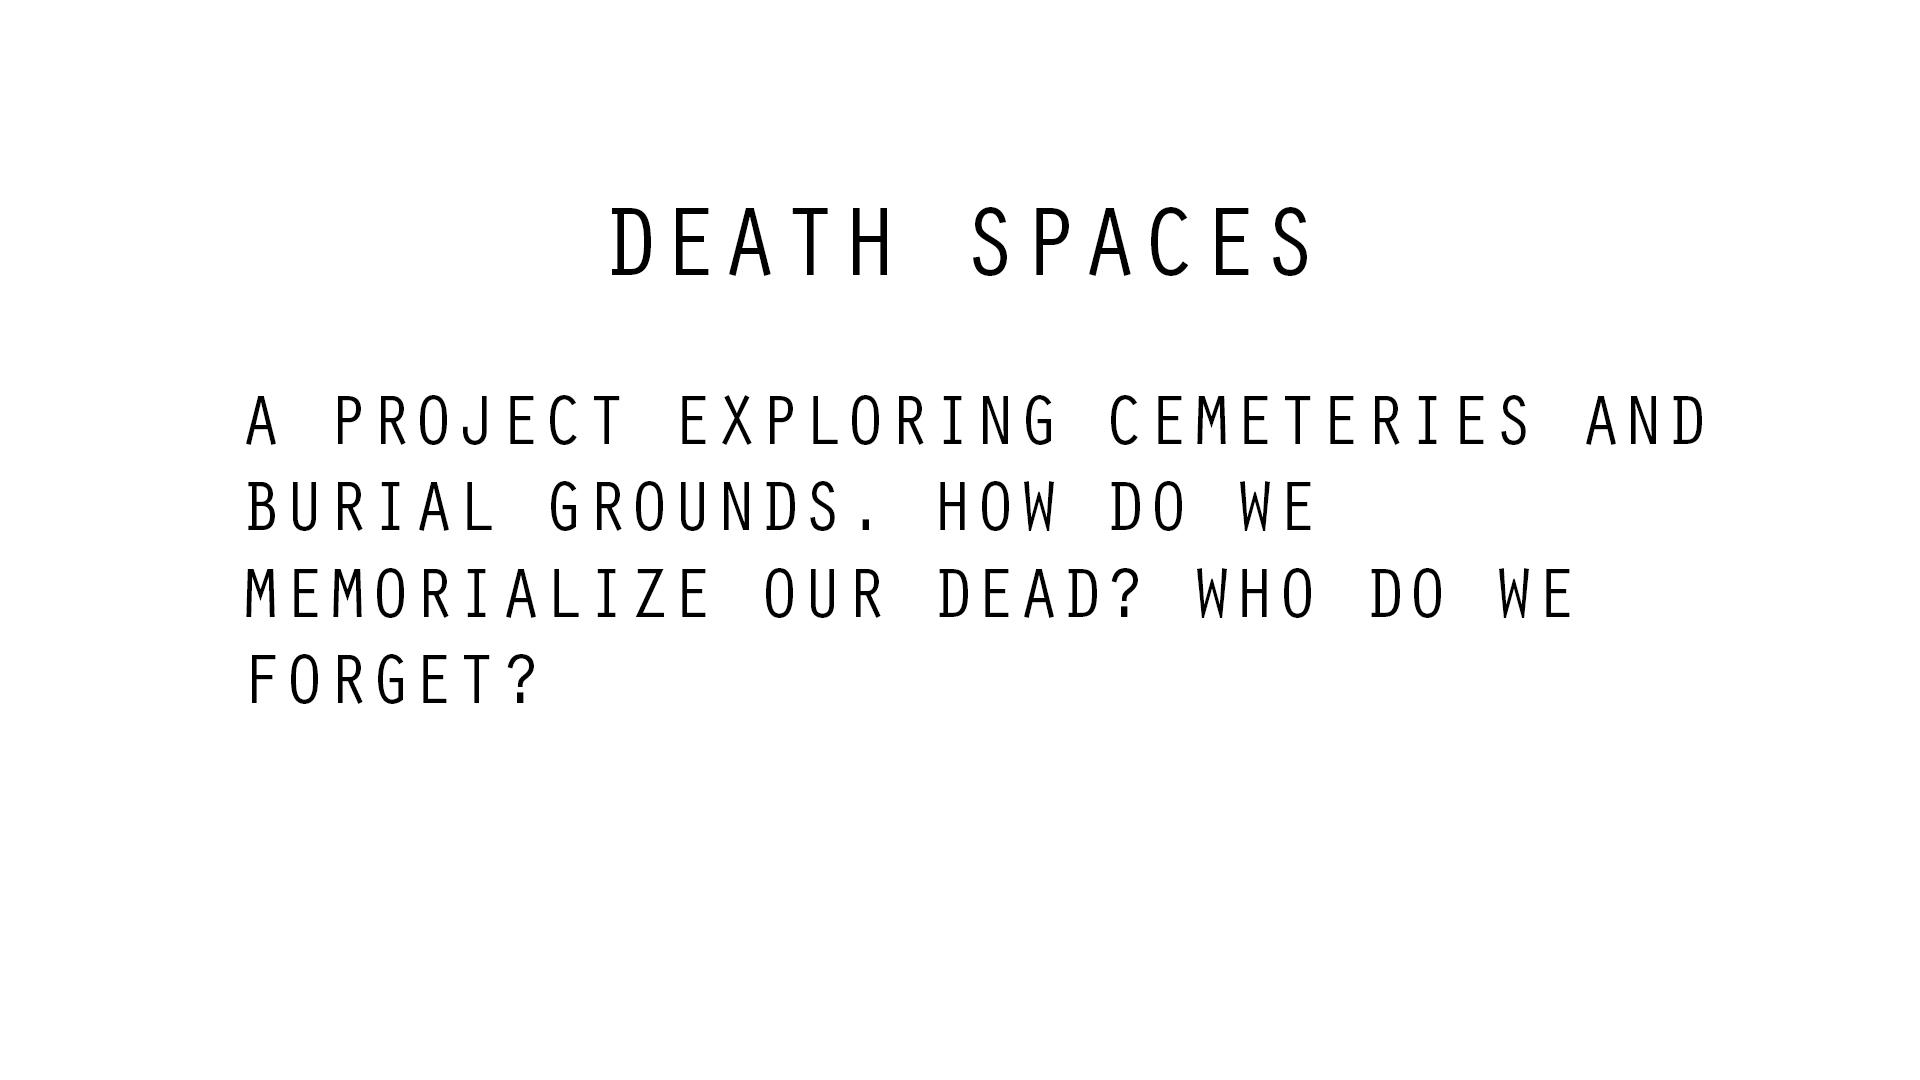 DeatheSpaces.jpg